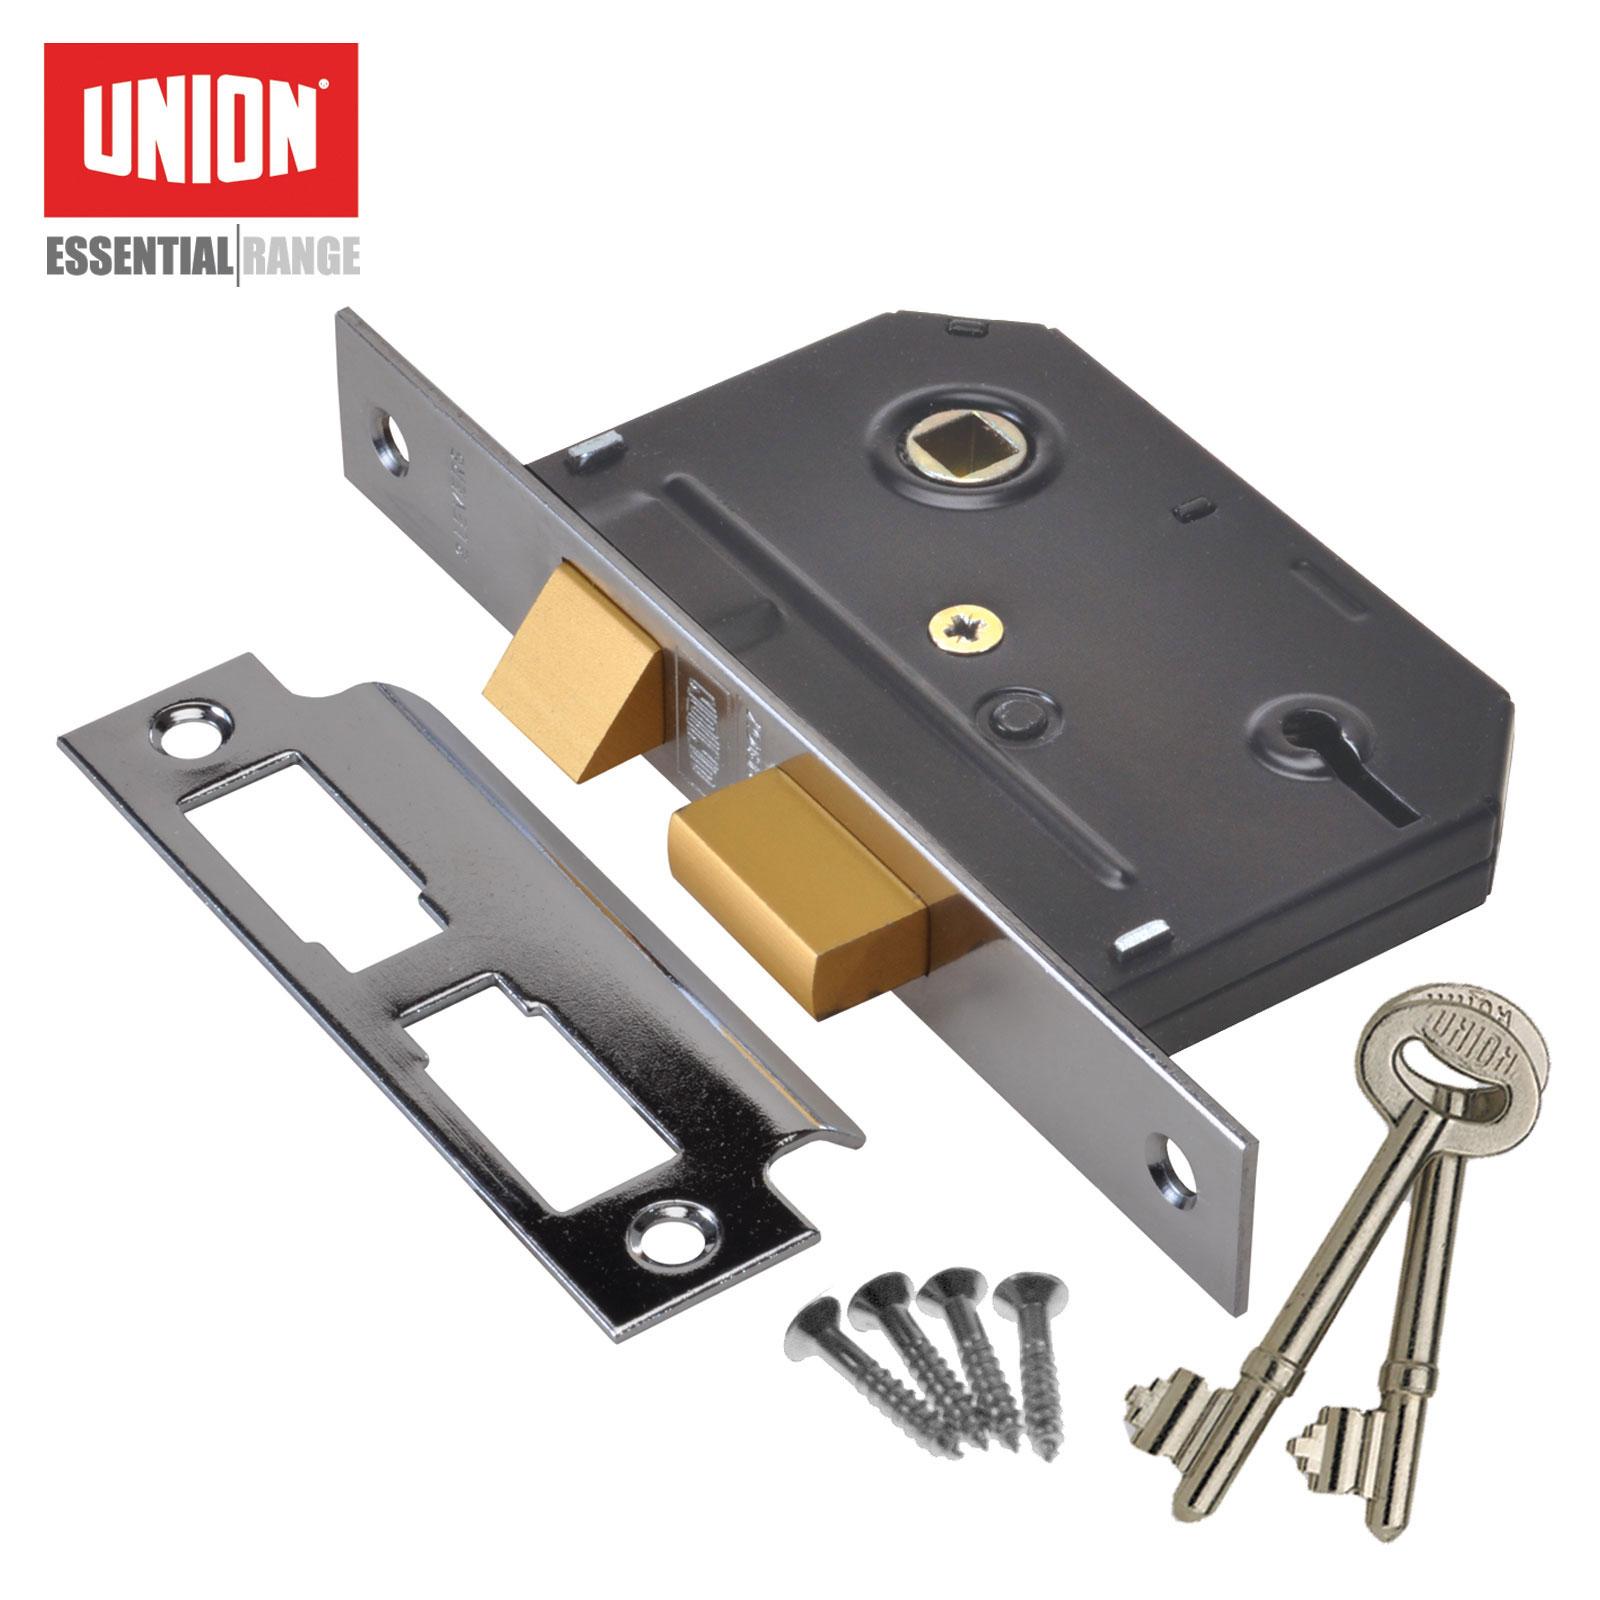 Union 3 Lever Sashlock - Essential Range